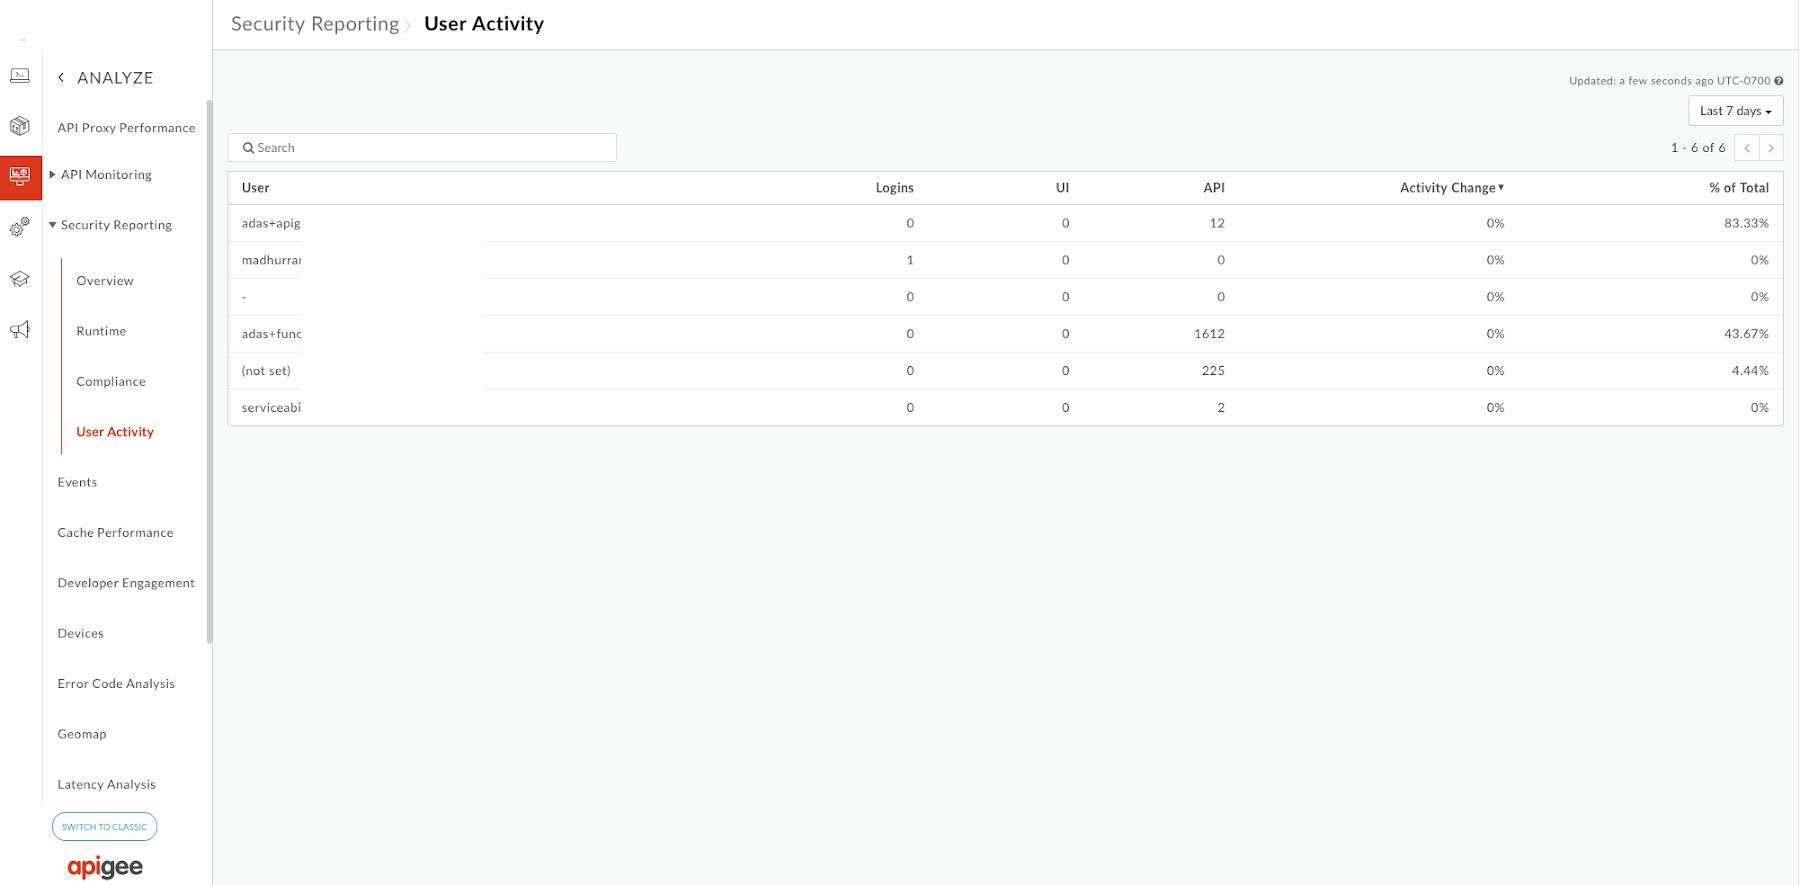 User_Activity